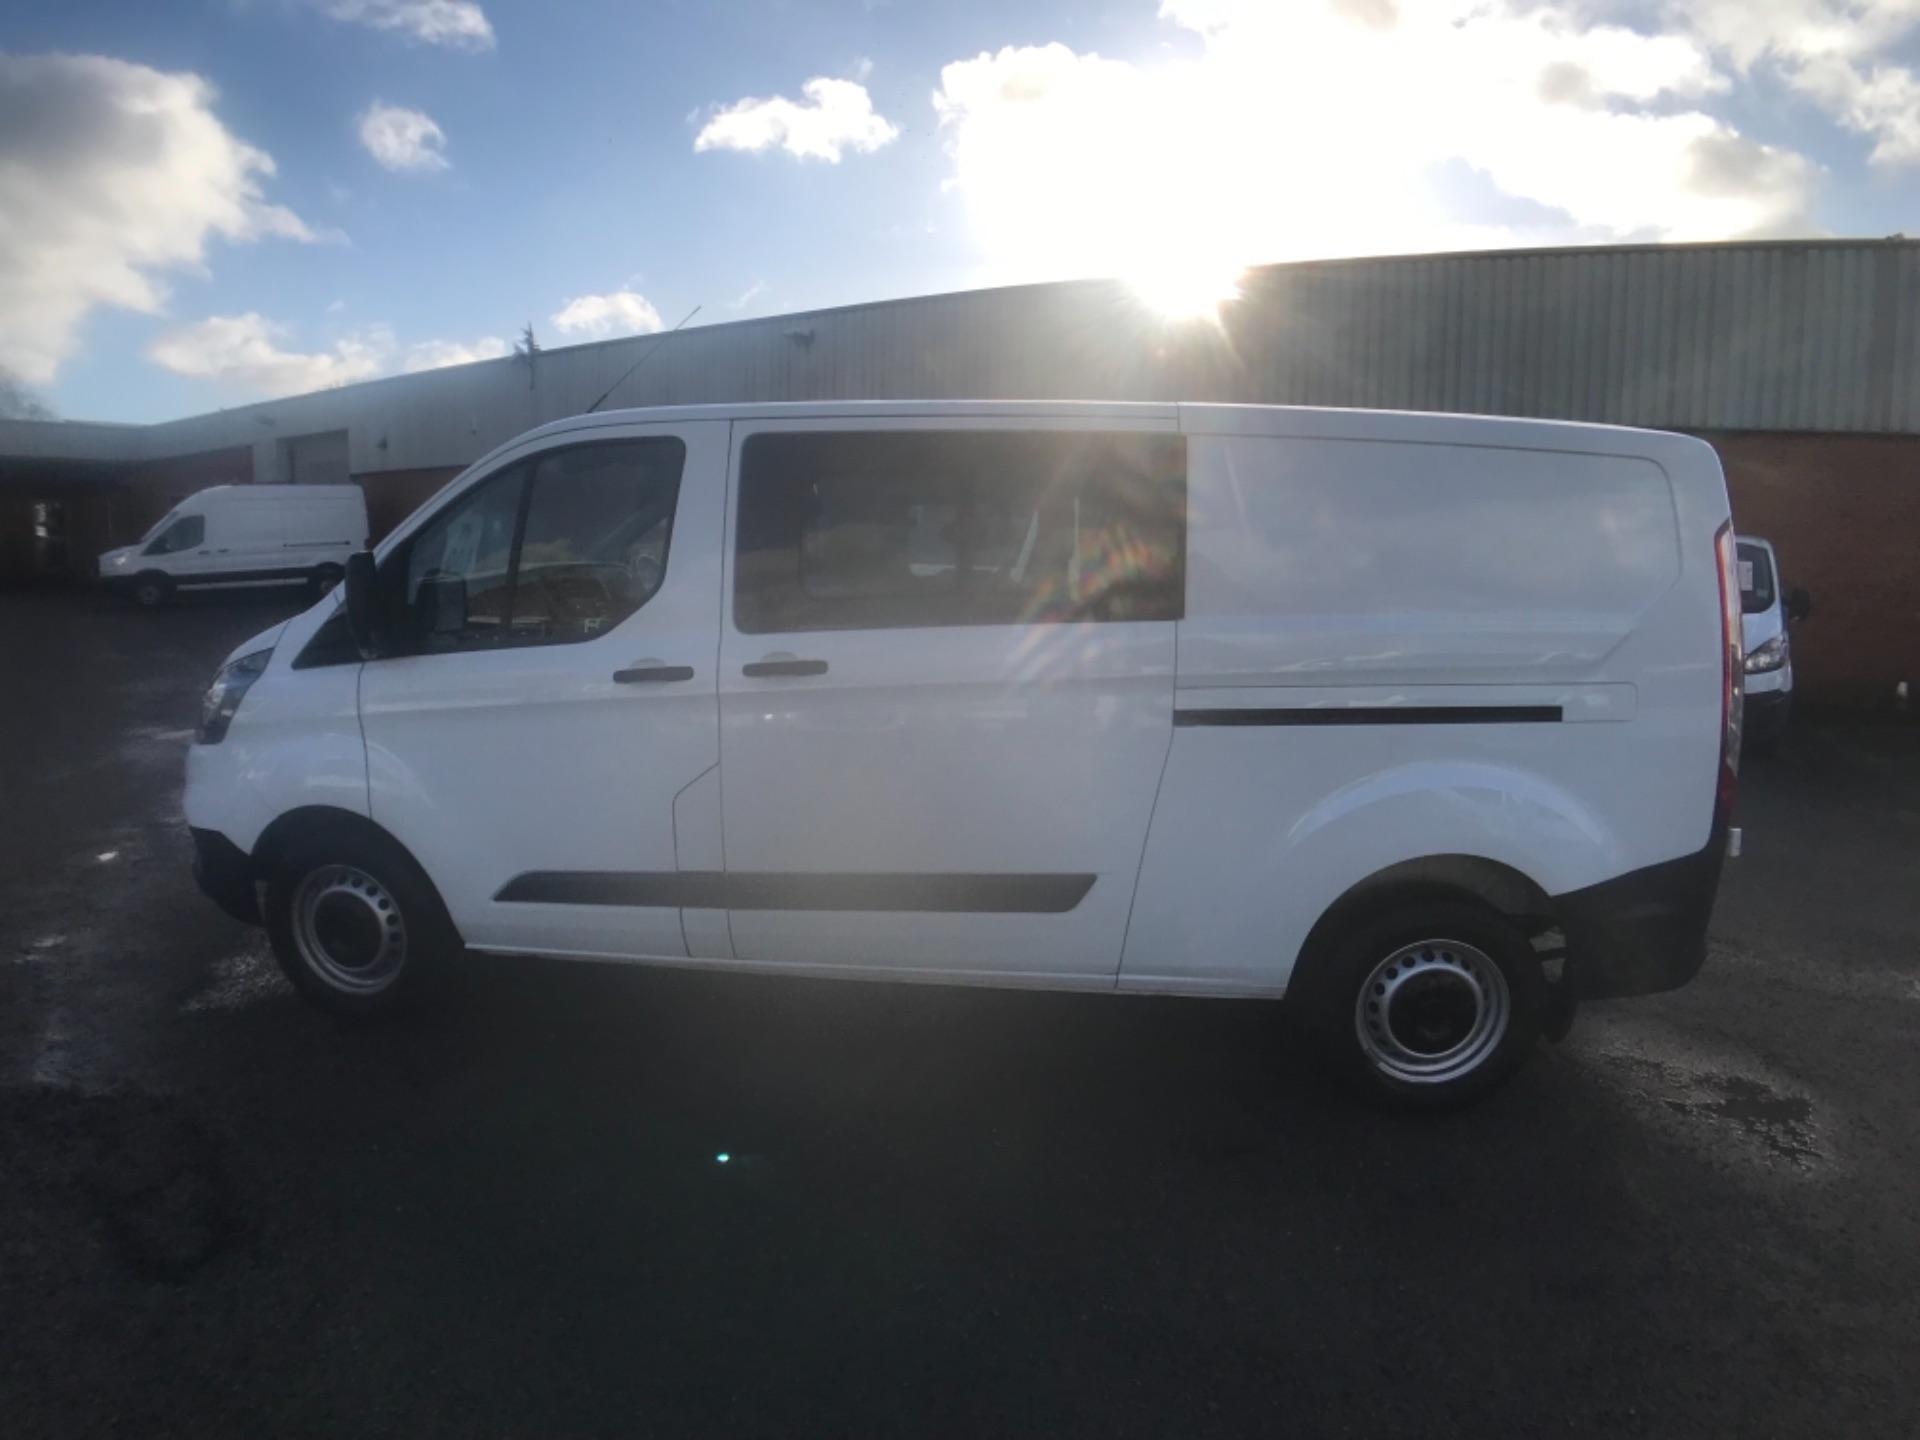 2018 Ford Transit Custom 320 L2 2.0 130ps D/Cab Euro 6 (BK18OLG) Image 4